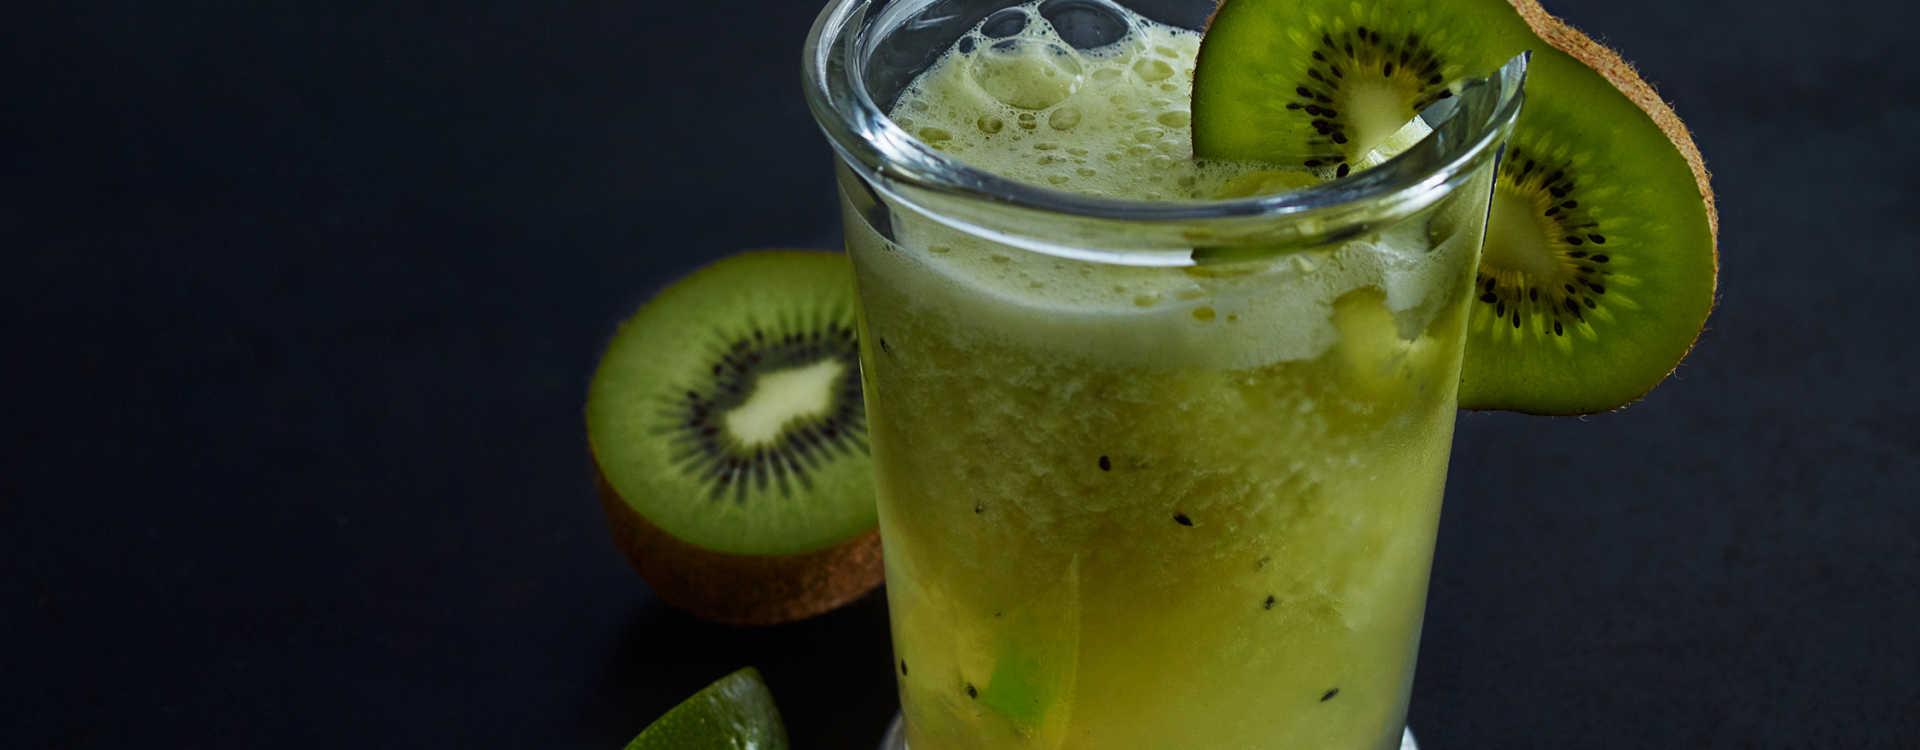 """Iced tea"" med lime, kiwi og ingefær"